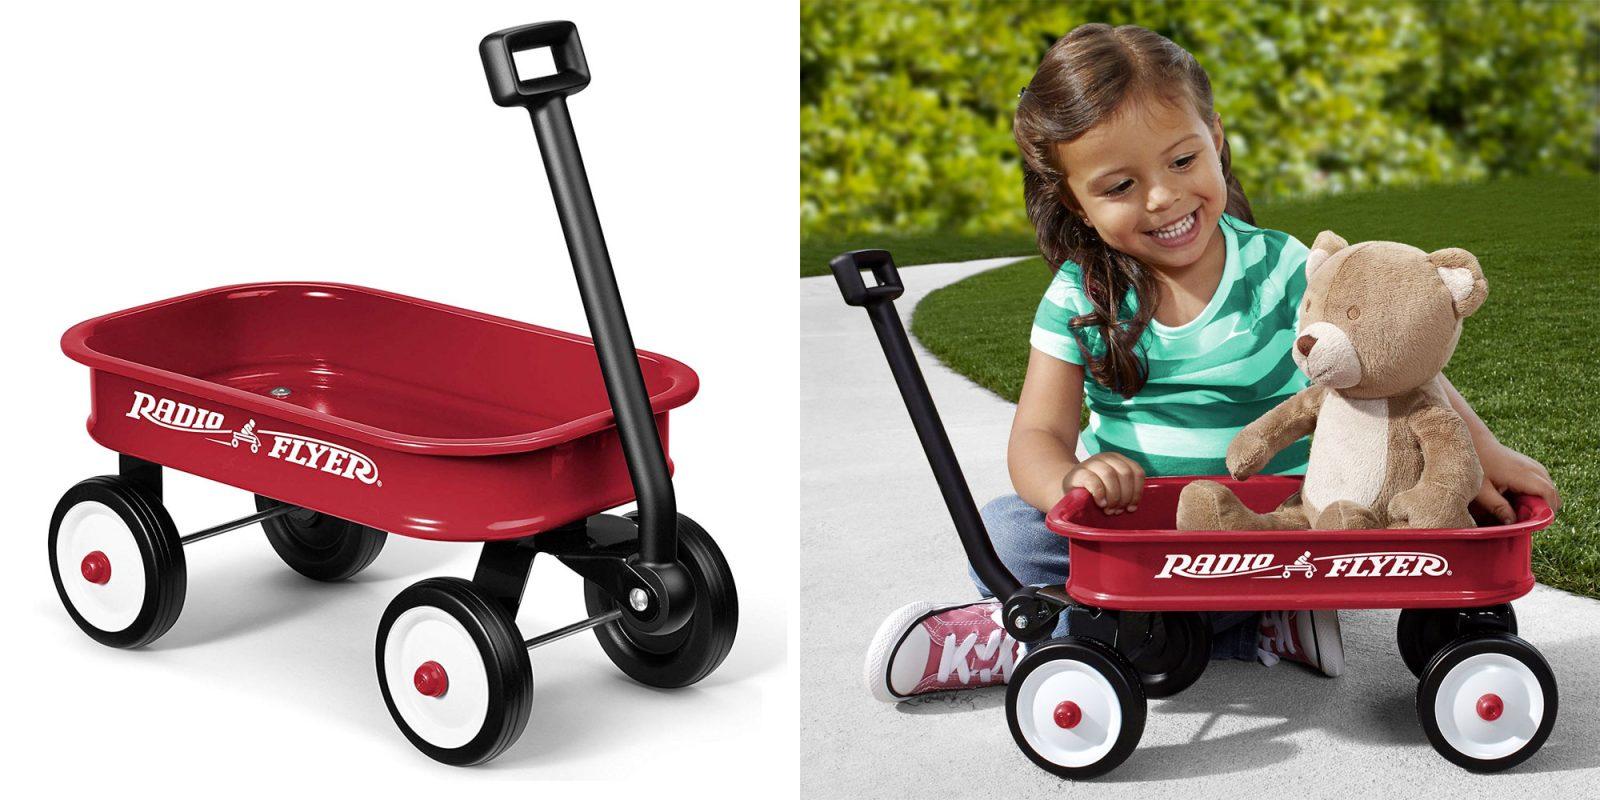 Enjoy evening strolls w/ Radio Flyer's best-selling Little Red Wagon for $10